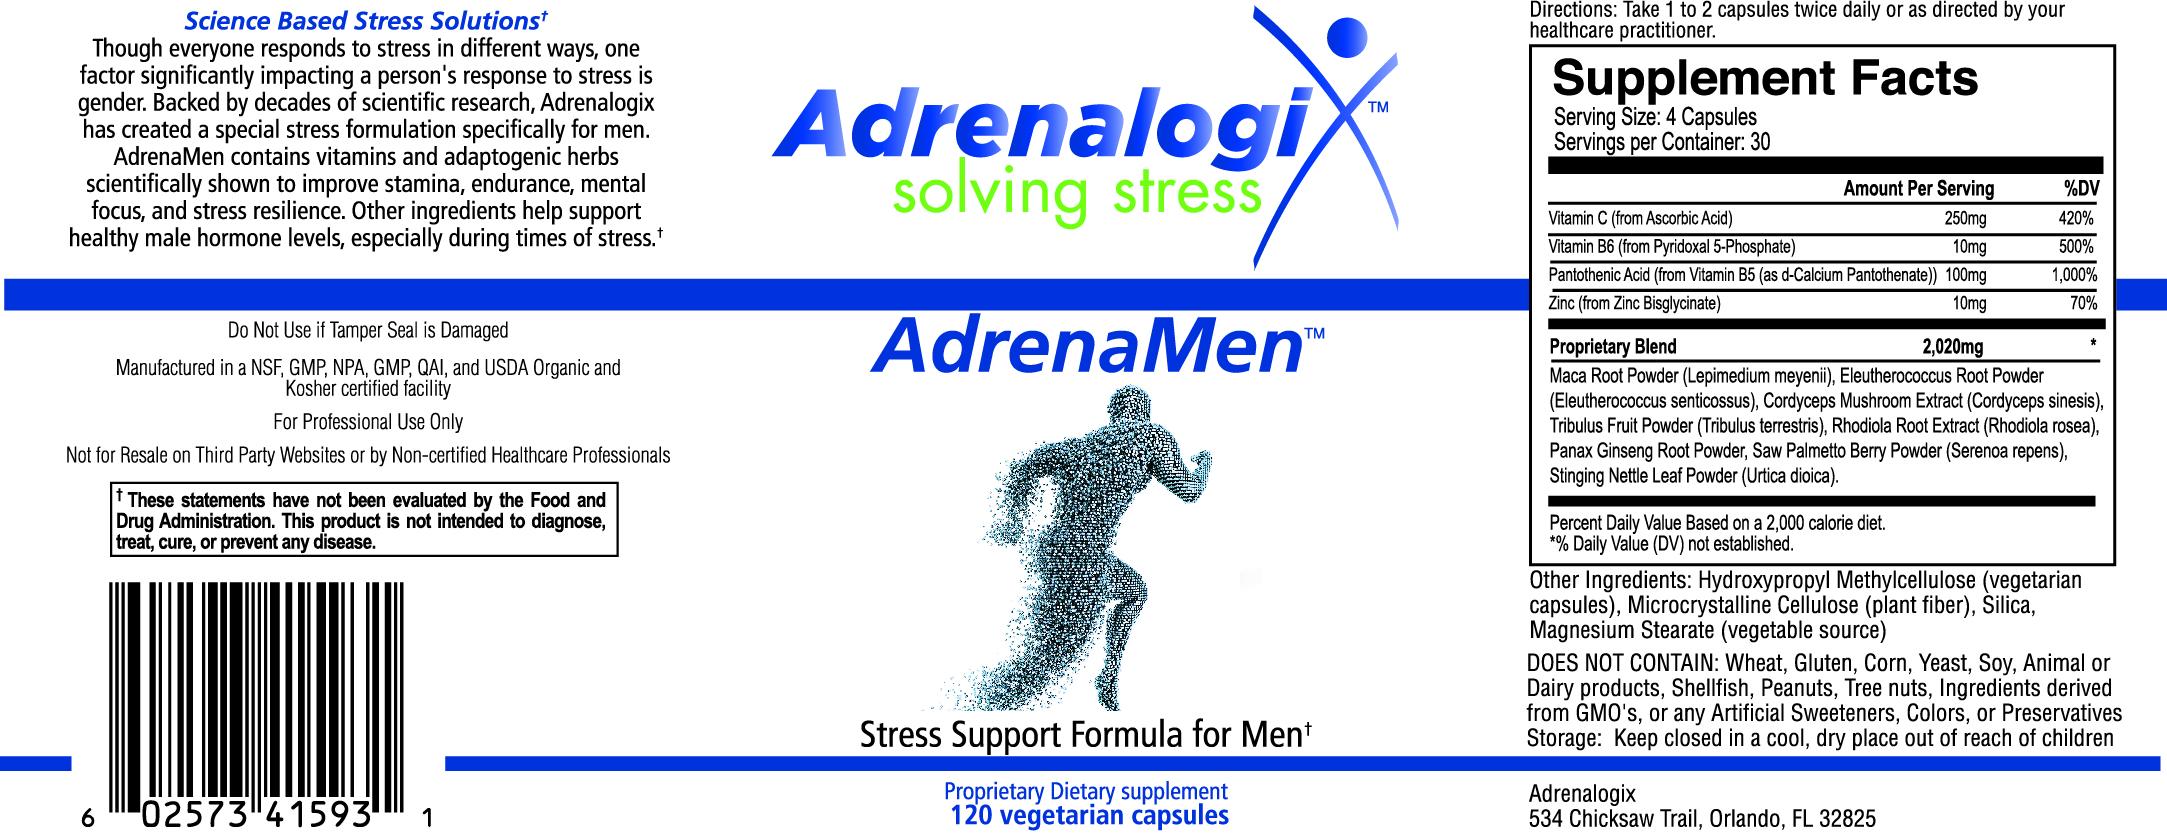 AdrenaMen_Label FINAL FOR PRINT.jpg